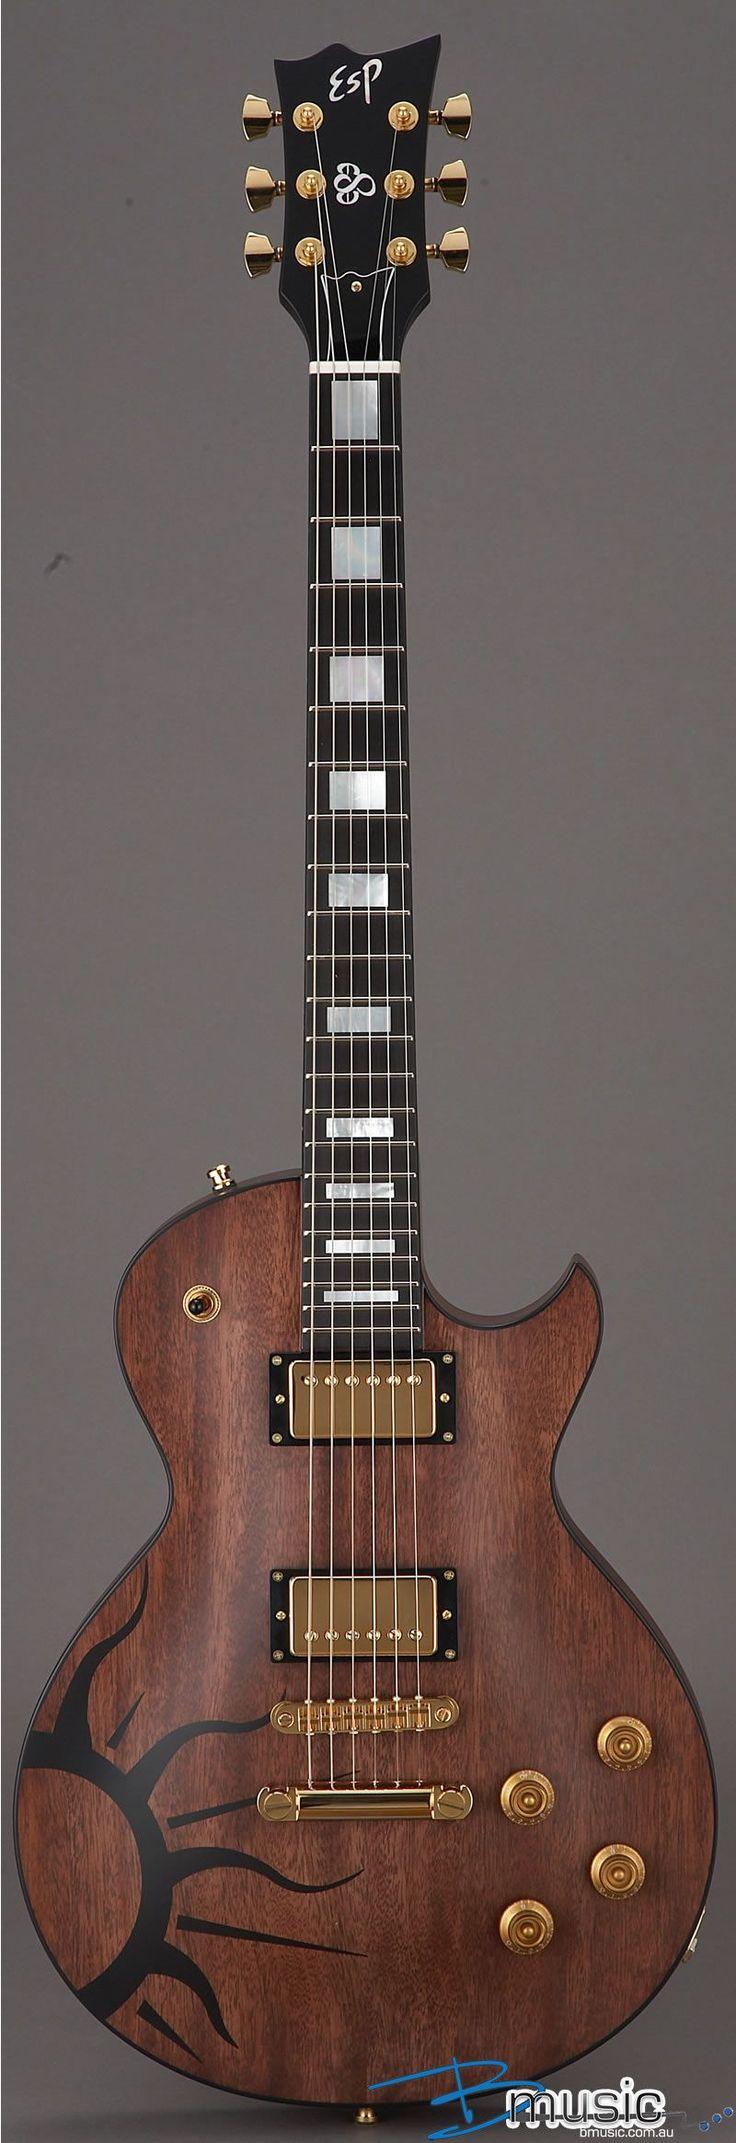 I'm really not into ESP guitars, but ESP Eclipse Esa Holopainen Signature is damn sweet guitar.